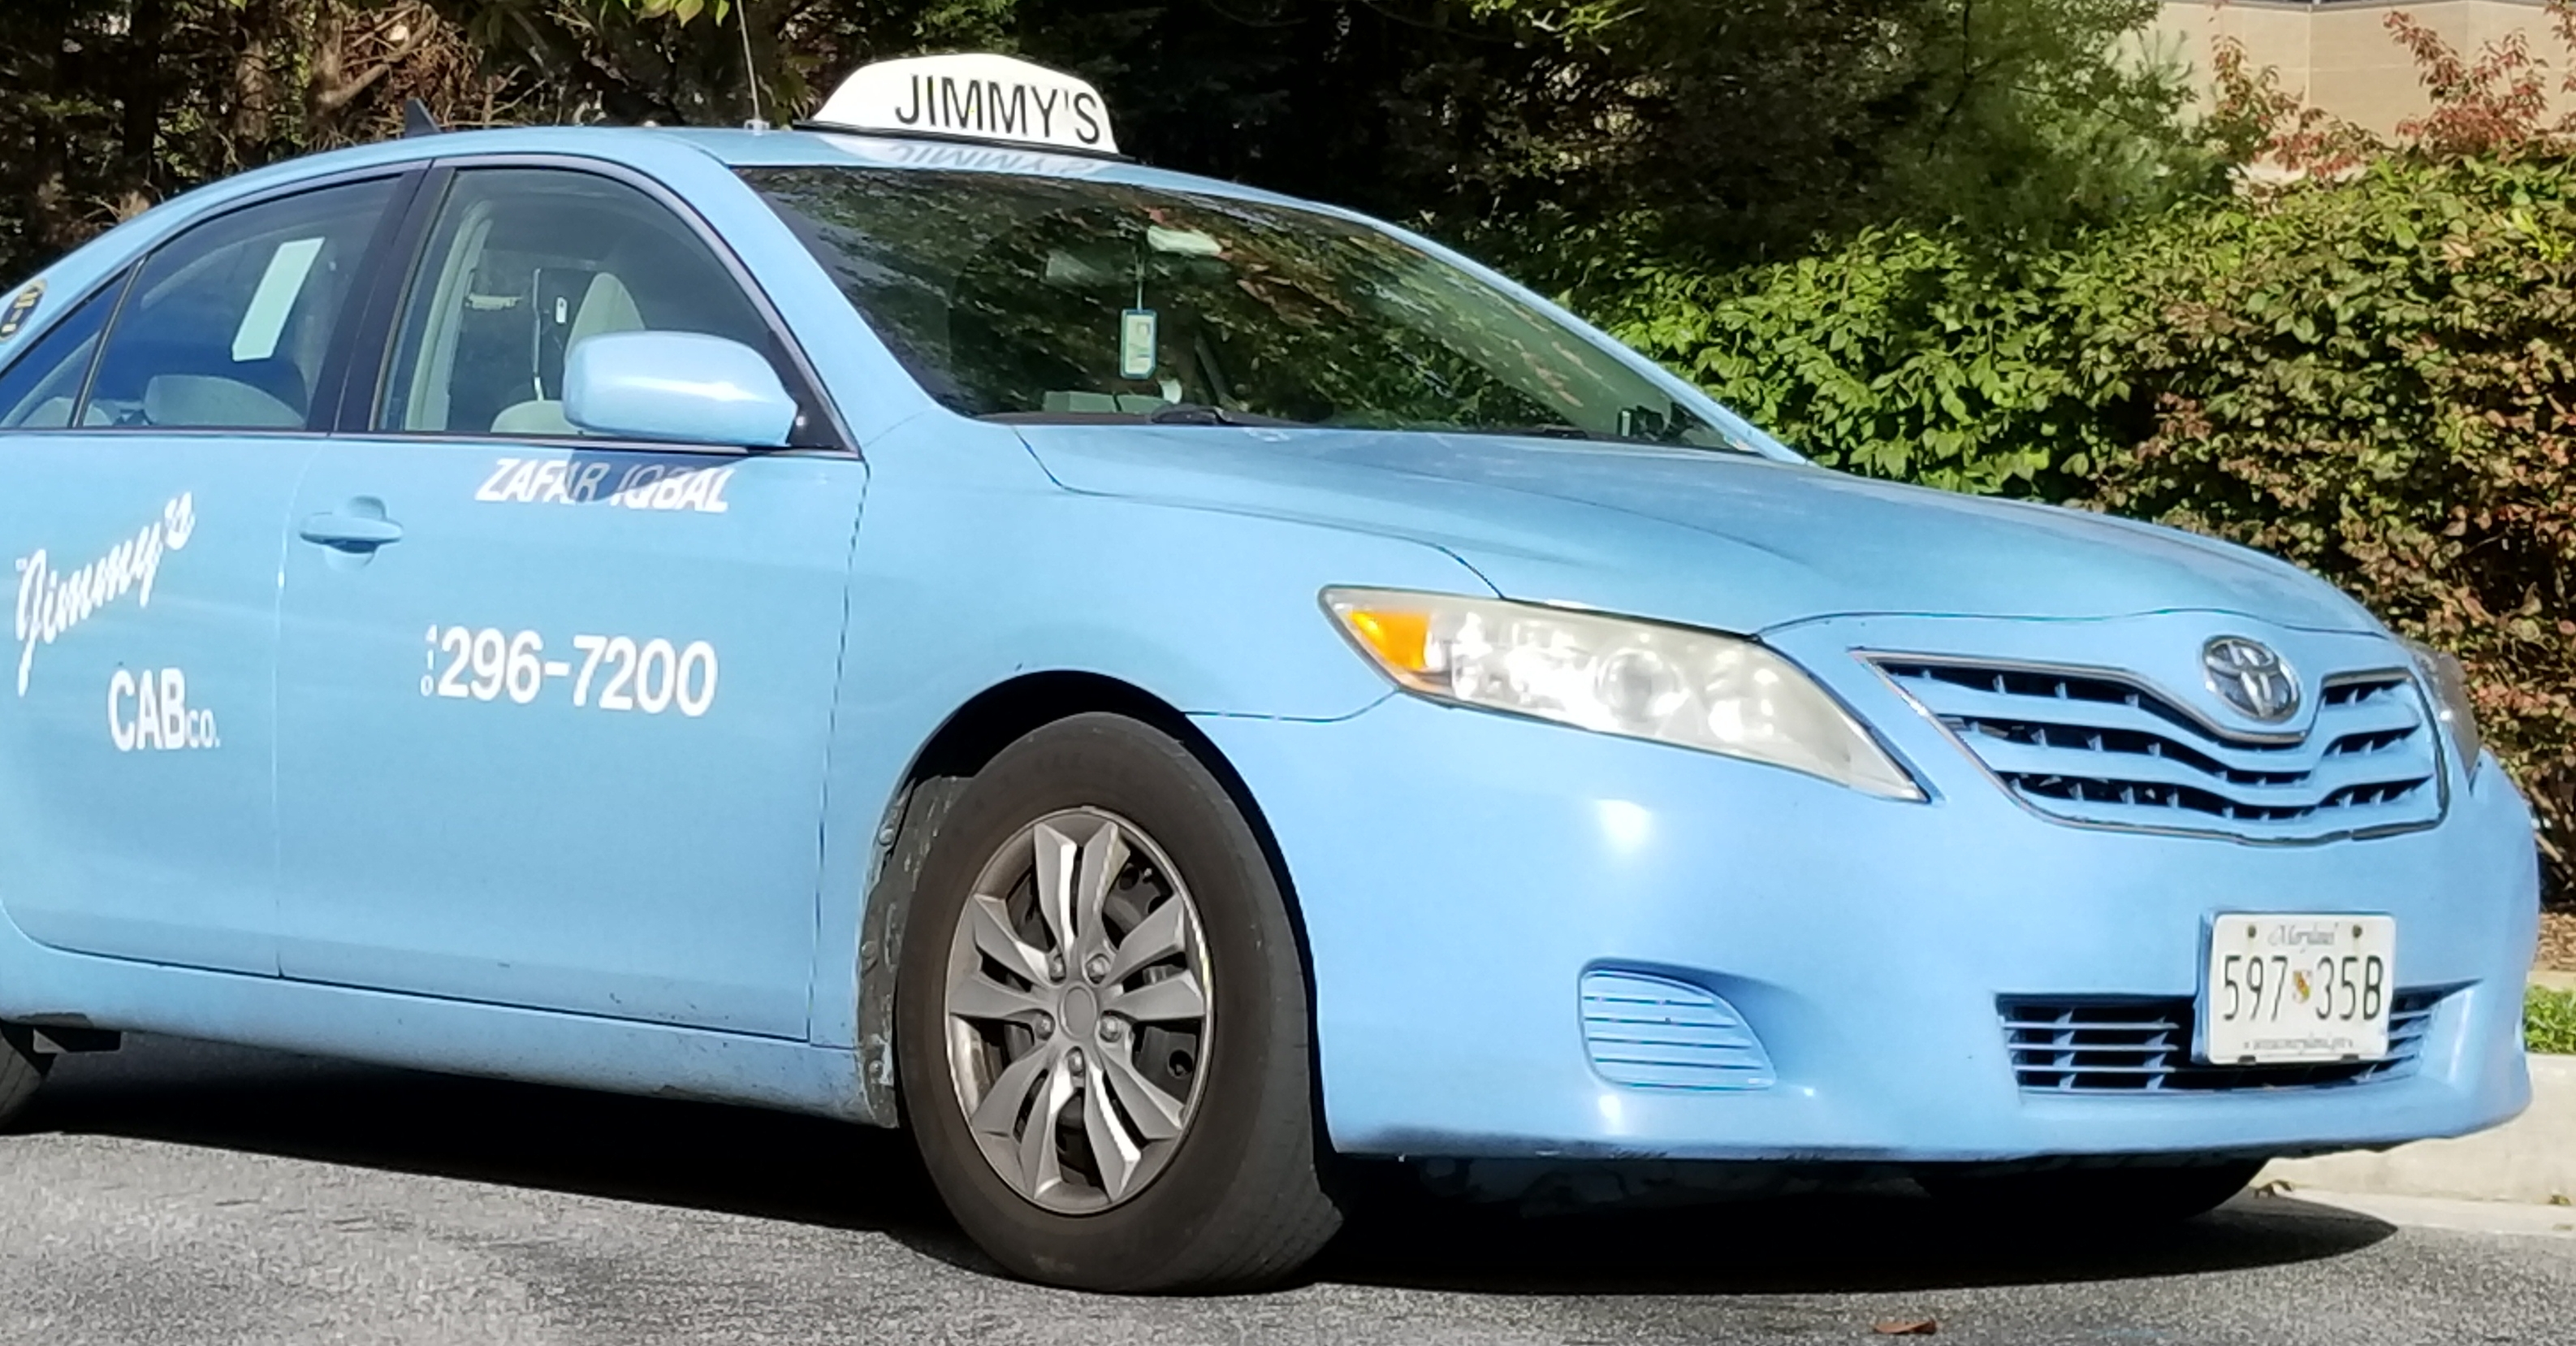 Jimmy's Cab Co image 3